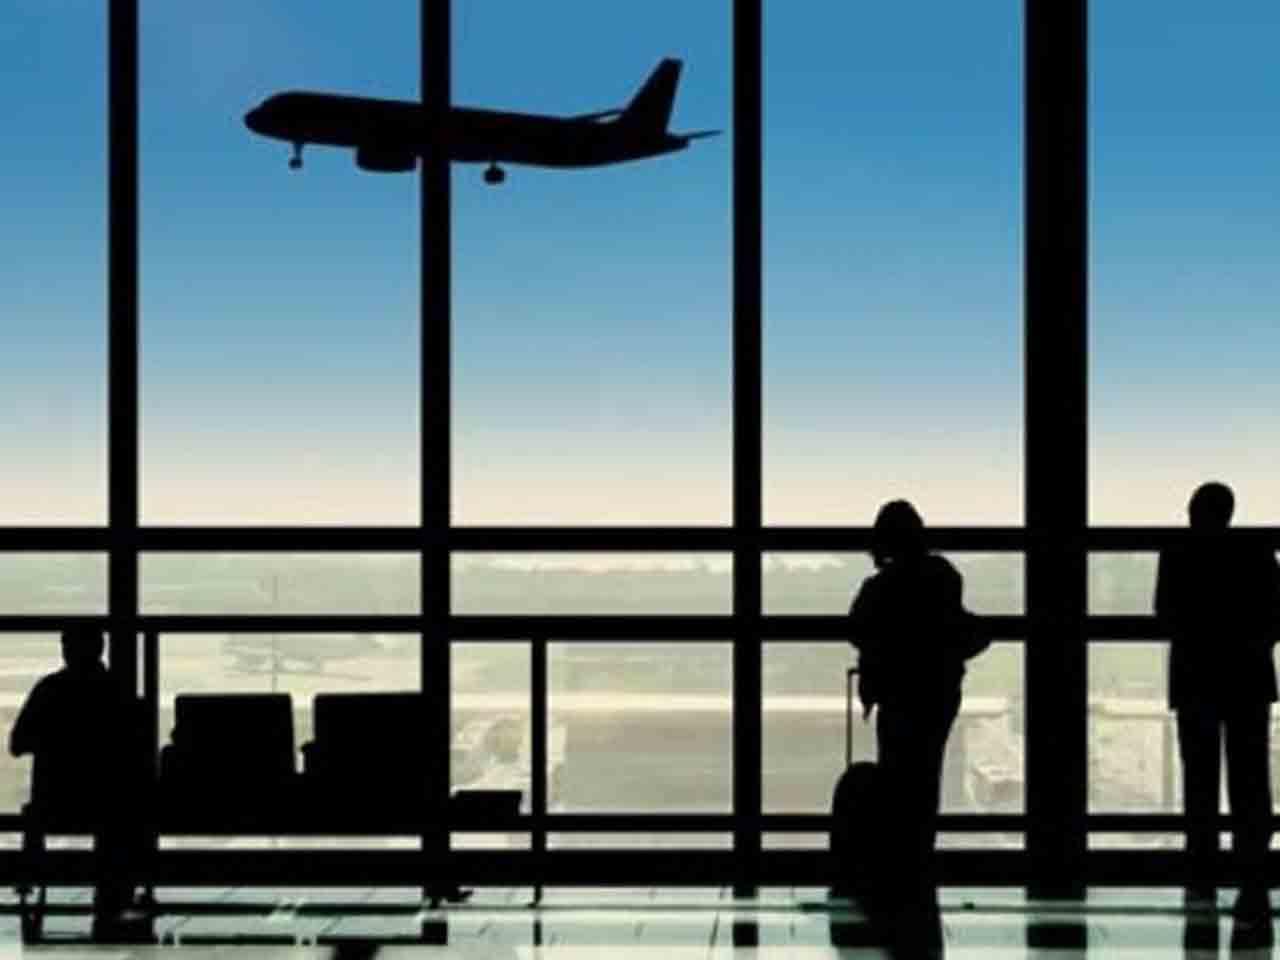 Harga Tiket Pesawat Turun Sejak 23 Oktober 2020 Ini Bandara Keberangkatannya Malukuterkini Com